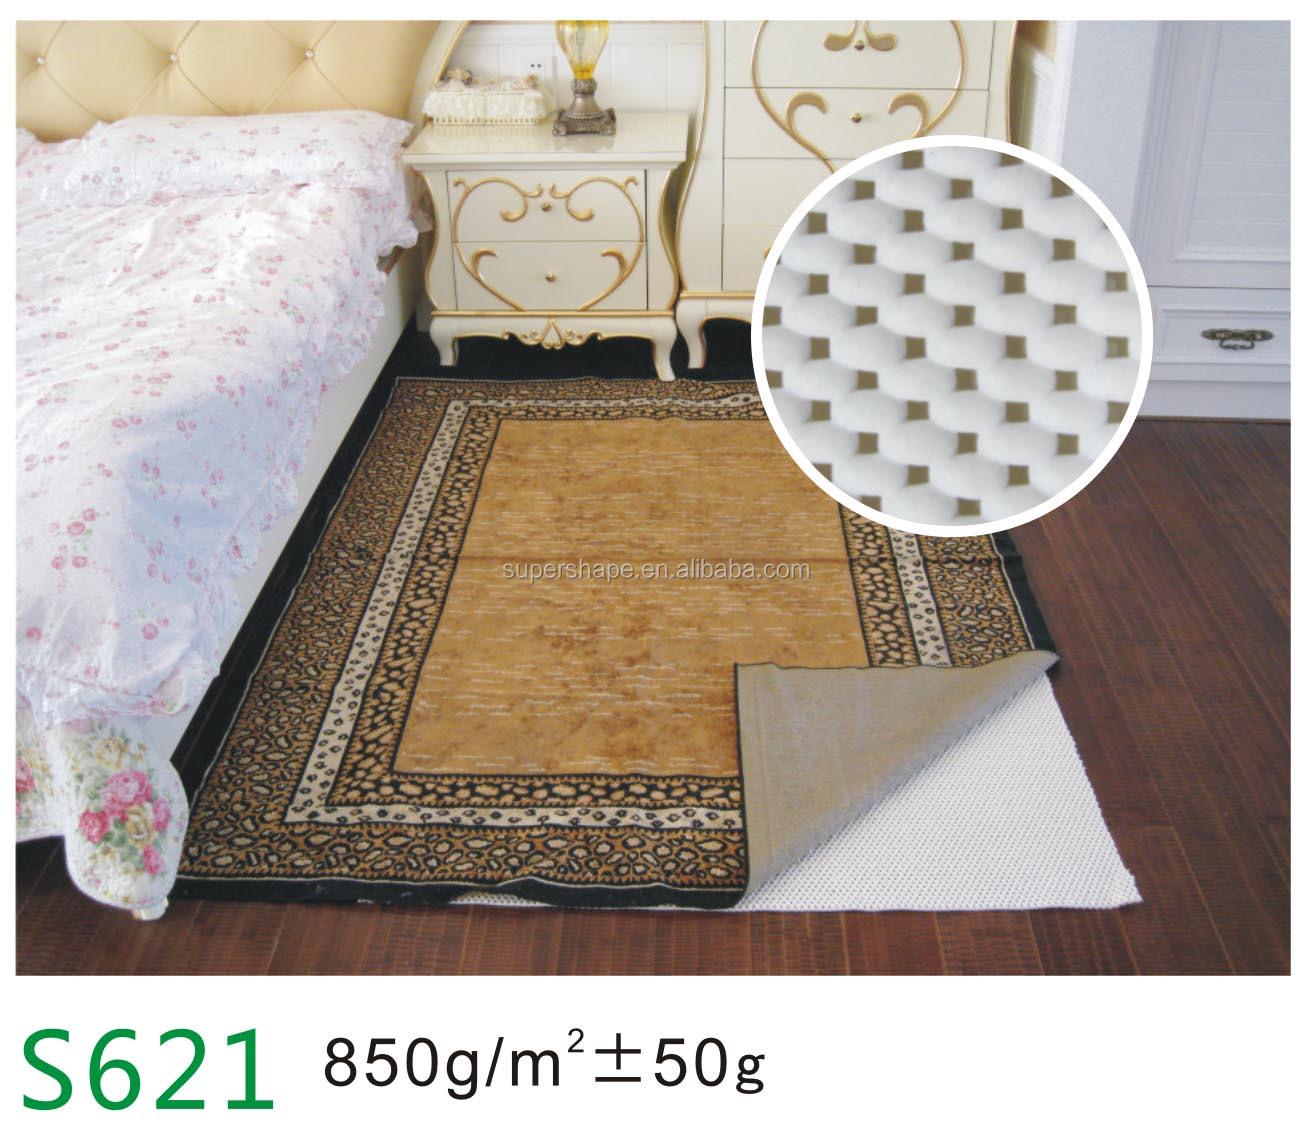 Pvc Foam Non Slip Grip Rug Pad Anti Carpet Underlay Product On Alibaba Com